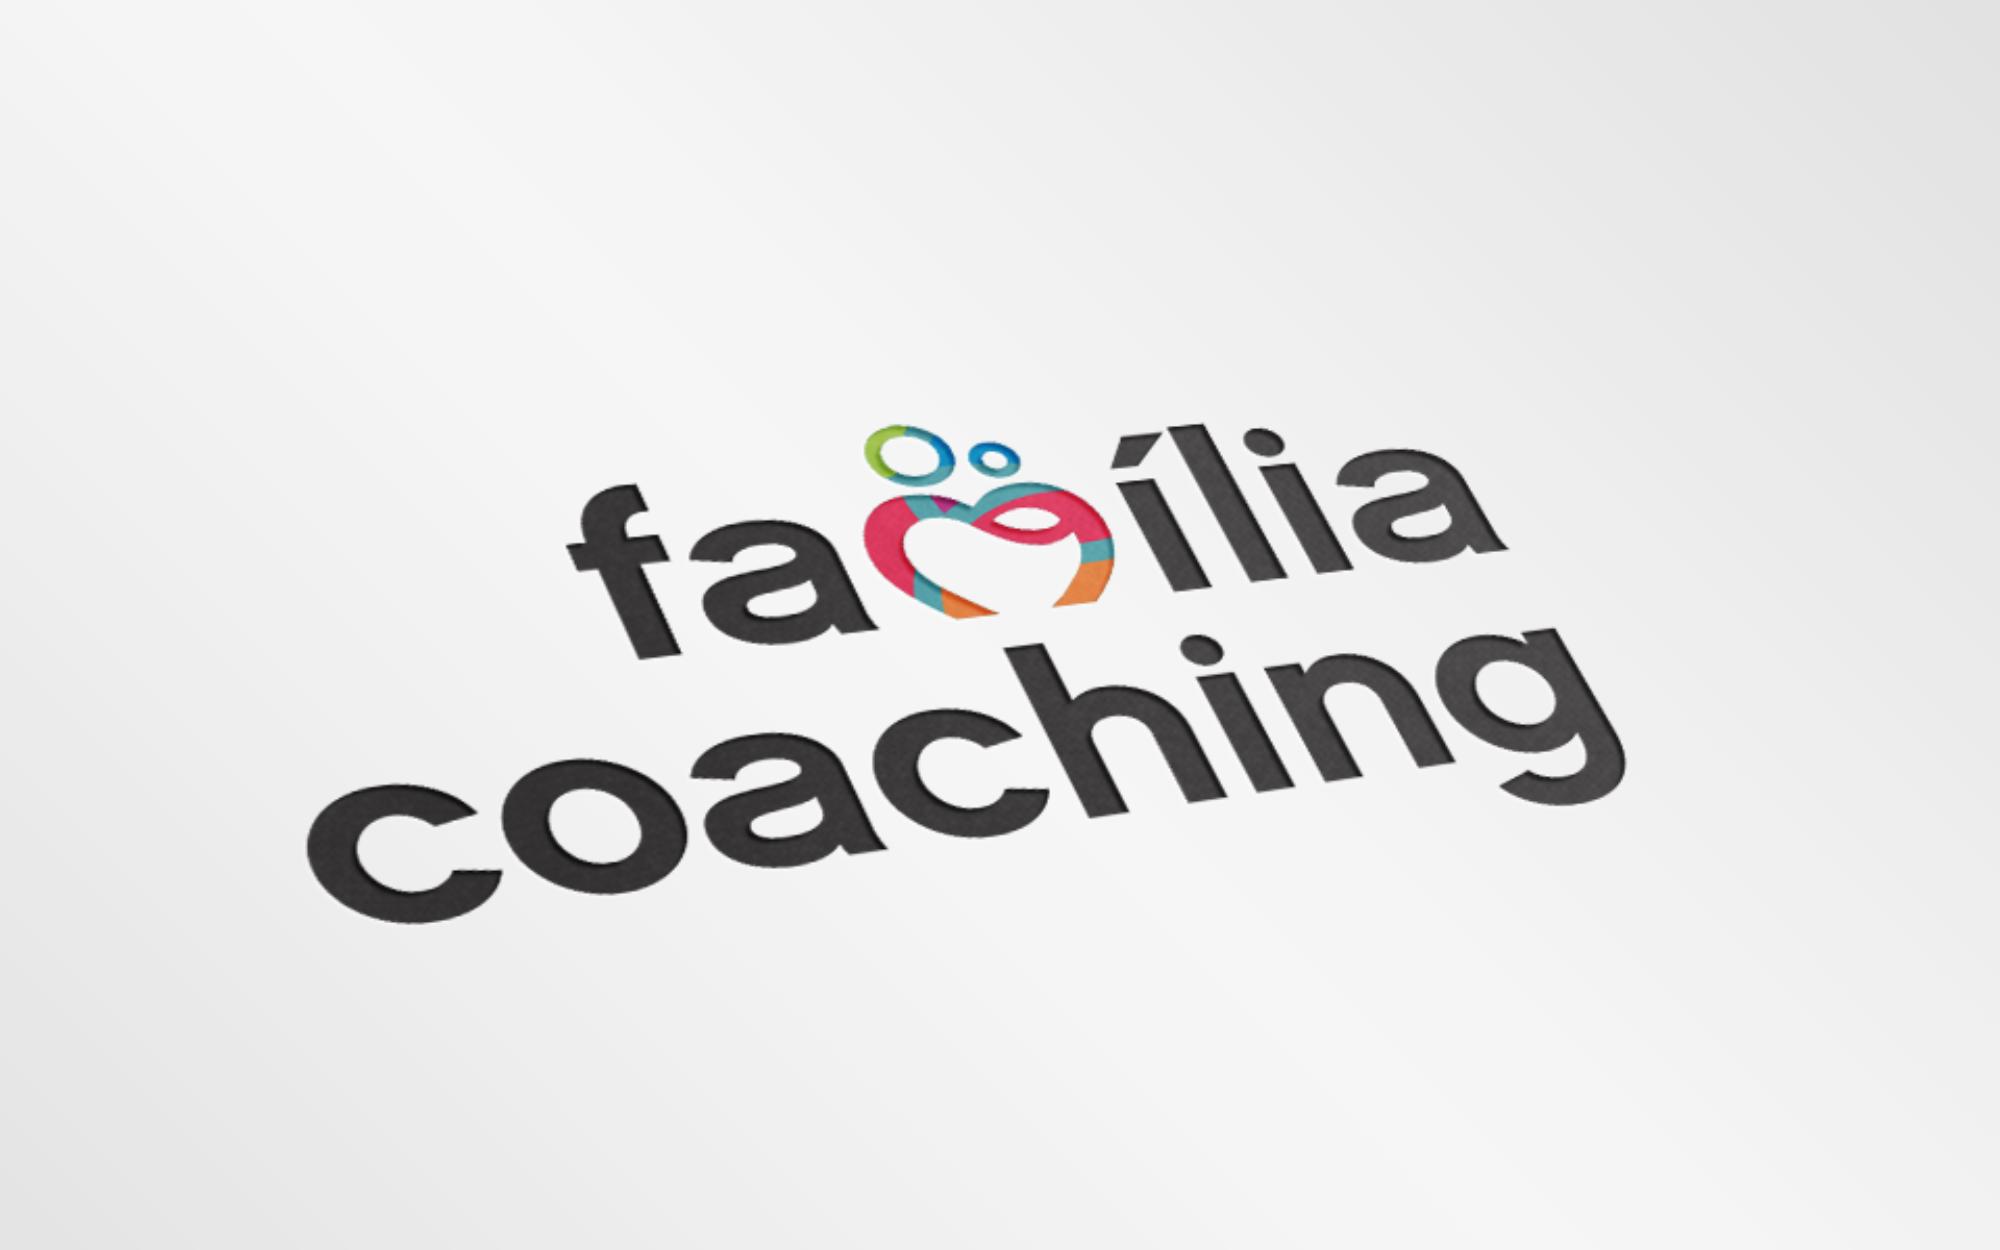 Família Coaching